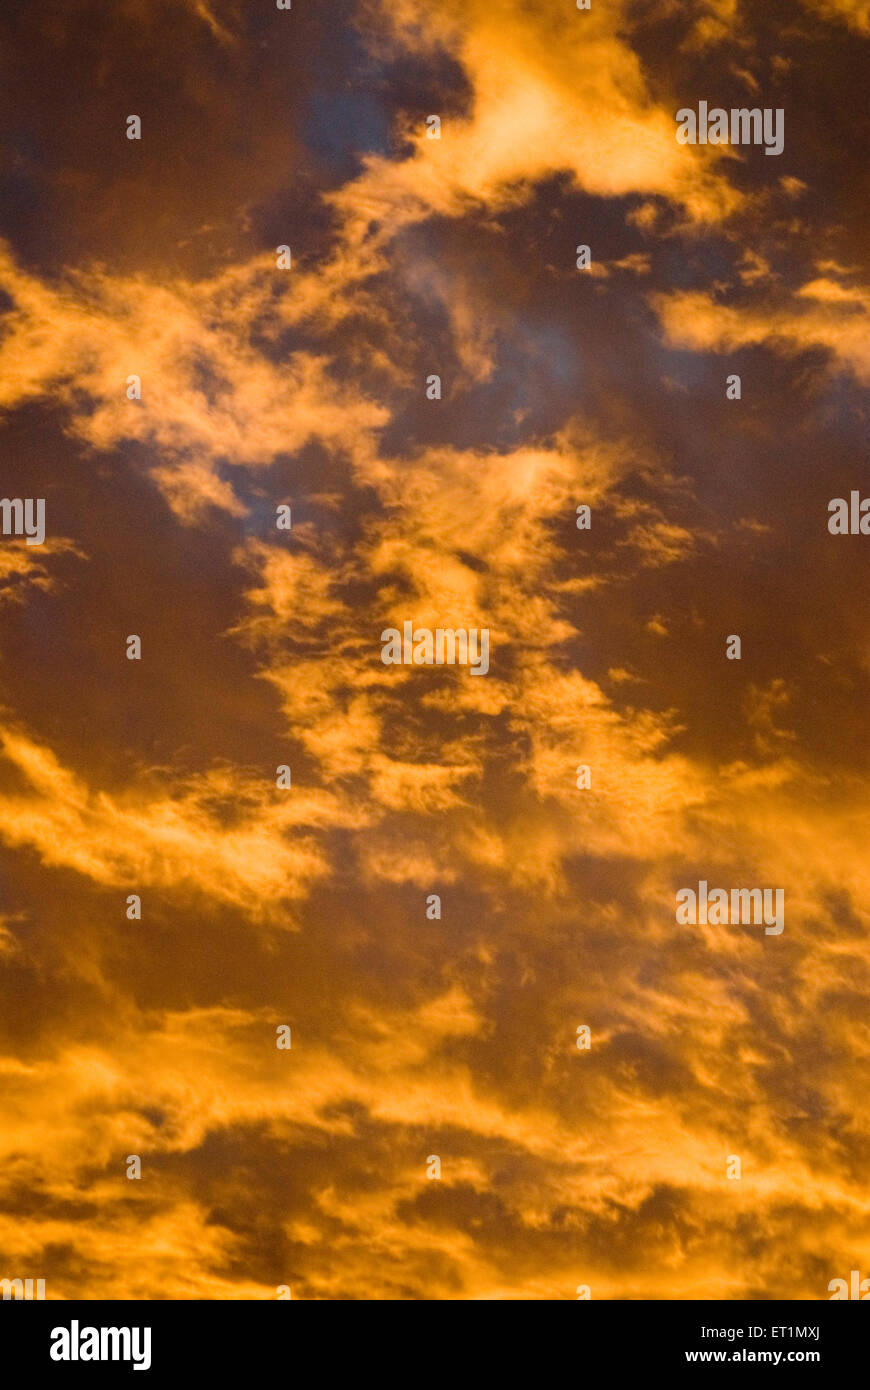 Burning red sky at time of sunrise at Chikhaldara